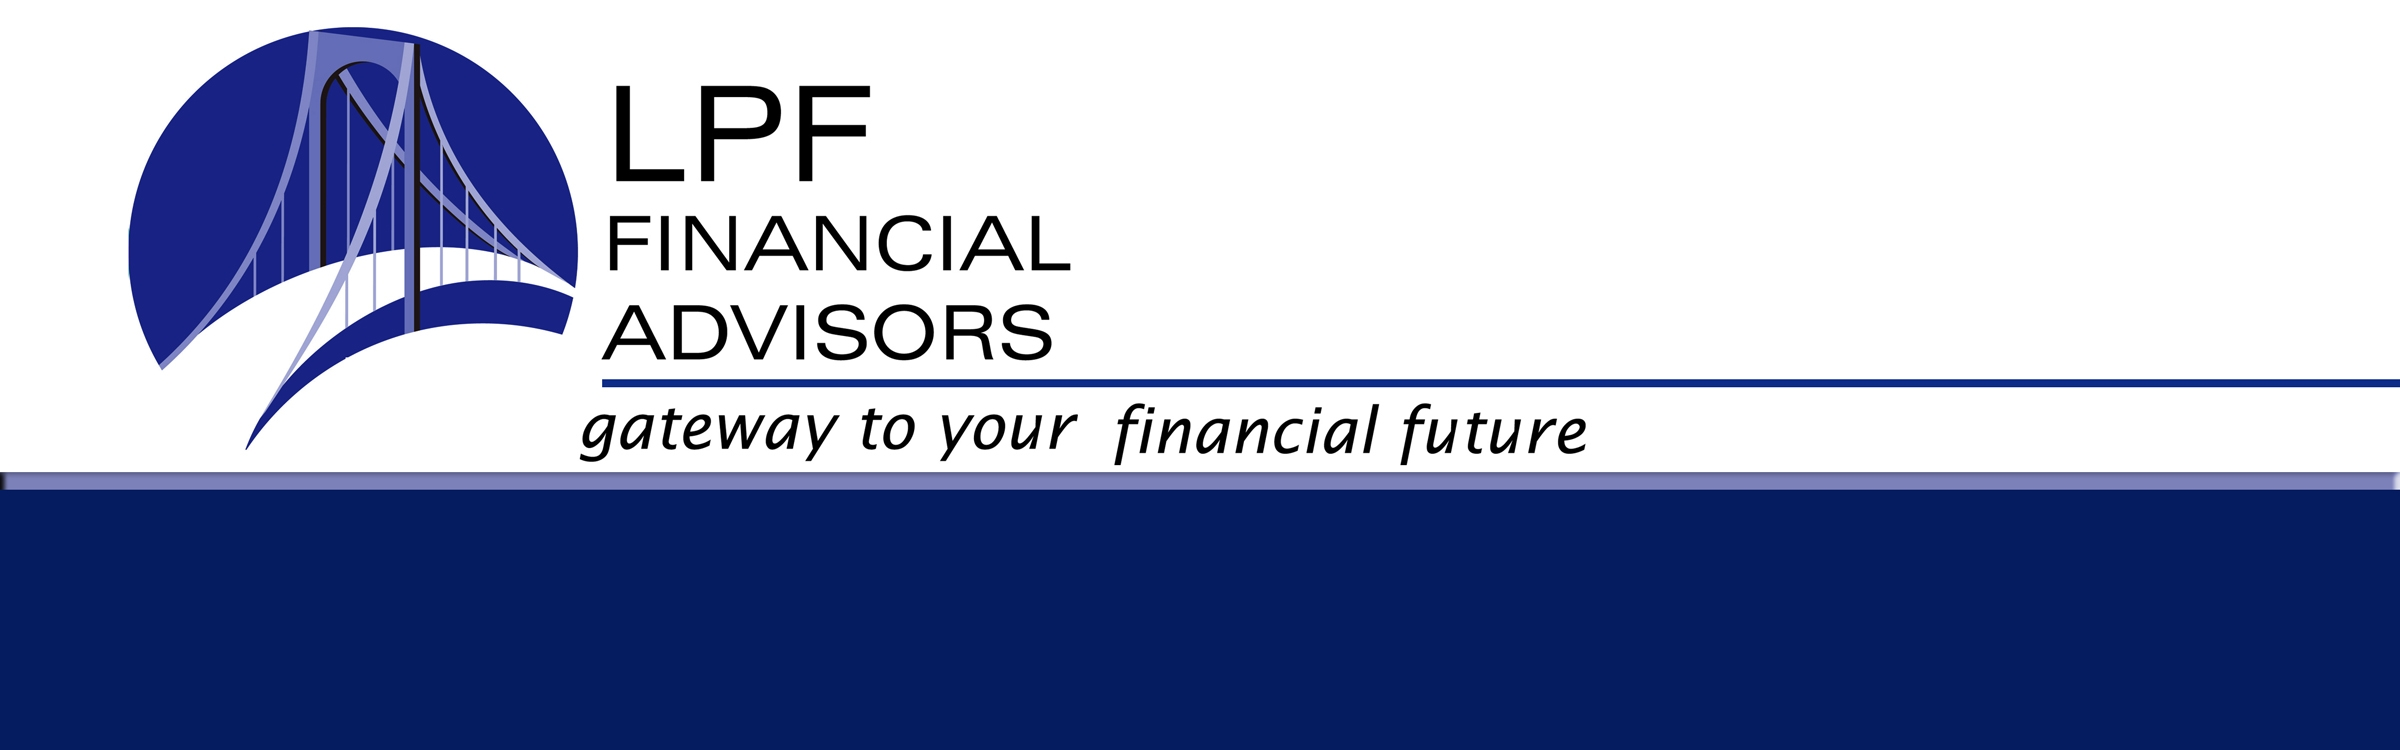 LPF Financial Advisors